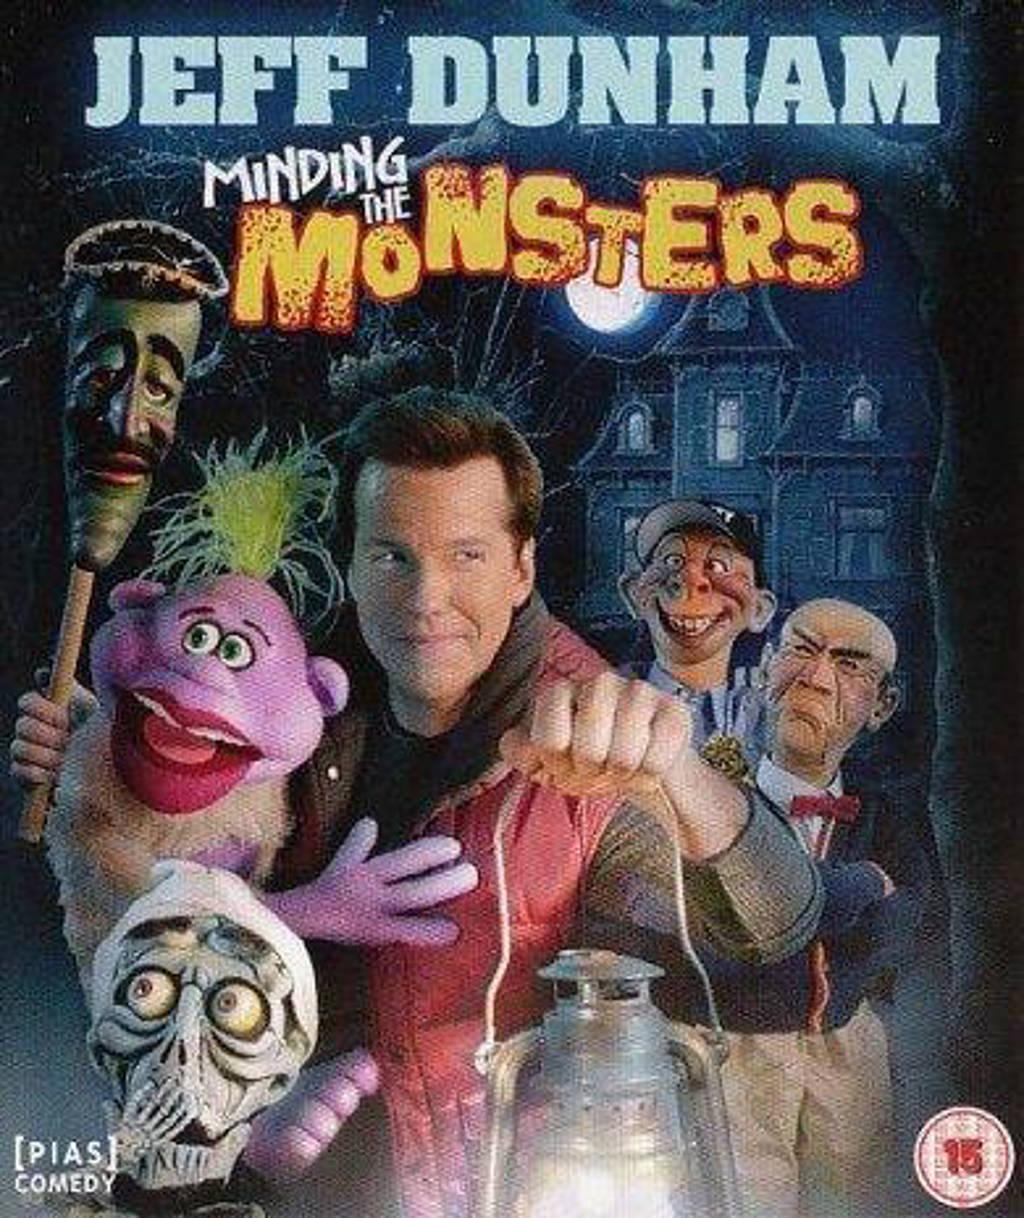 Jeff Dunham - Minding The Monsters (Blu-ray)